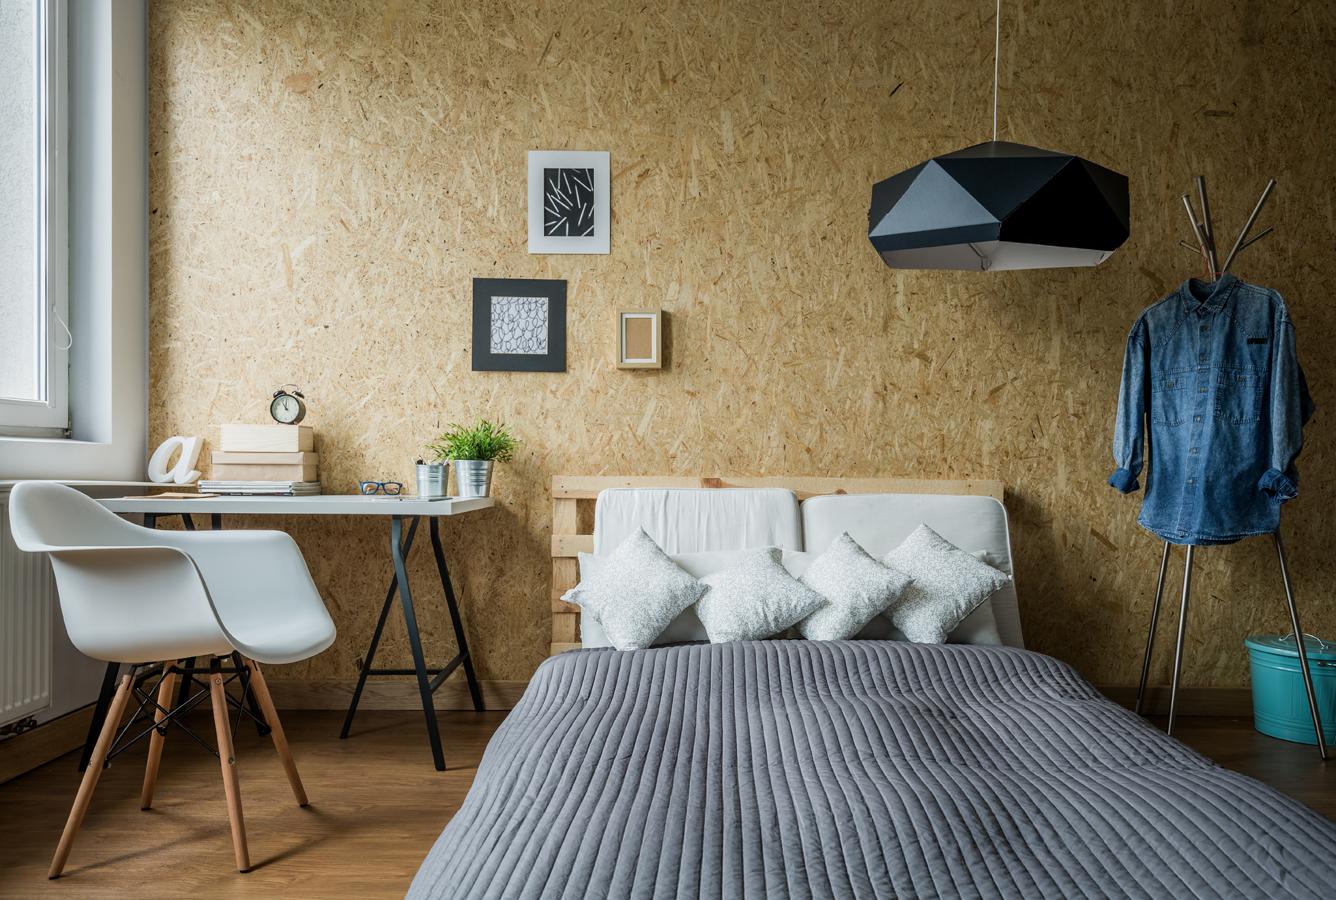 Chambre id es d coration et peinture - Idee deco peinture chambre ...